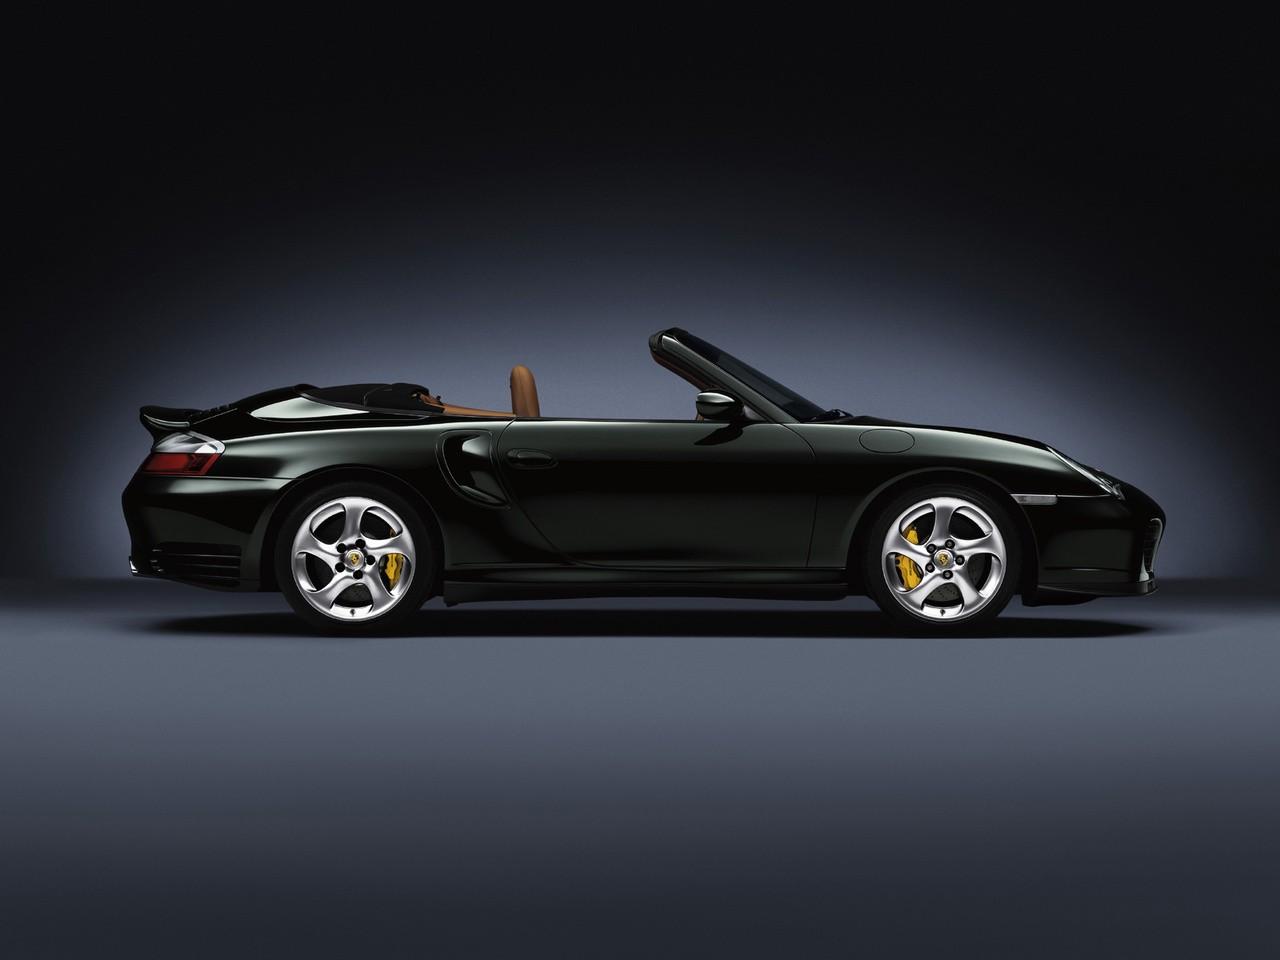 Porsche 996 Turbo S >> PORSCHE 911 Turbo S Cabriolet (996) - 2004, 2005, 2006 - autoevolution